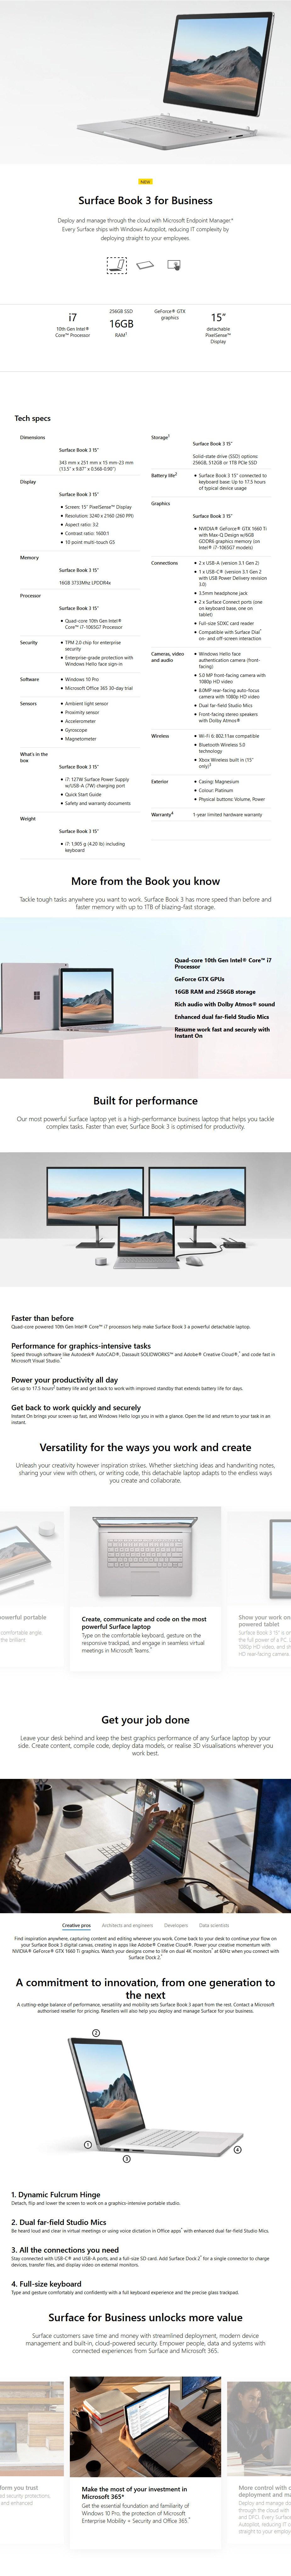 "Microsoft Surface Book 3 15"" i7-1065G7 16GB 256GB Nvidia GTX 1660Ti W10P - Overview 1"